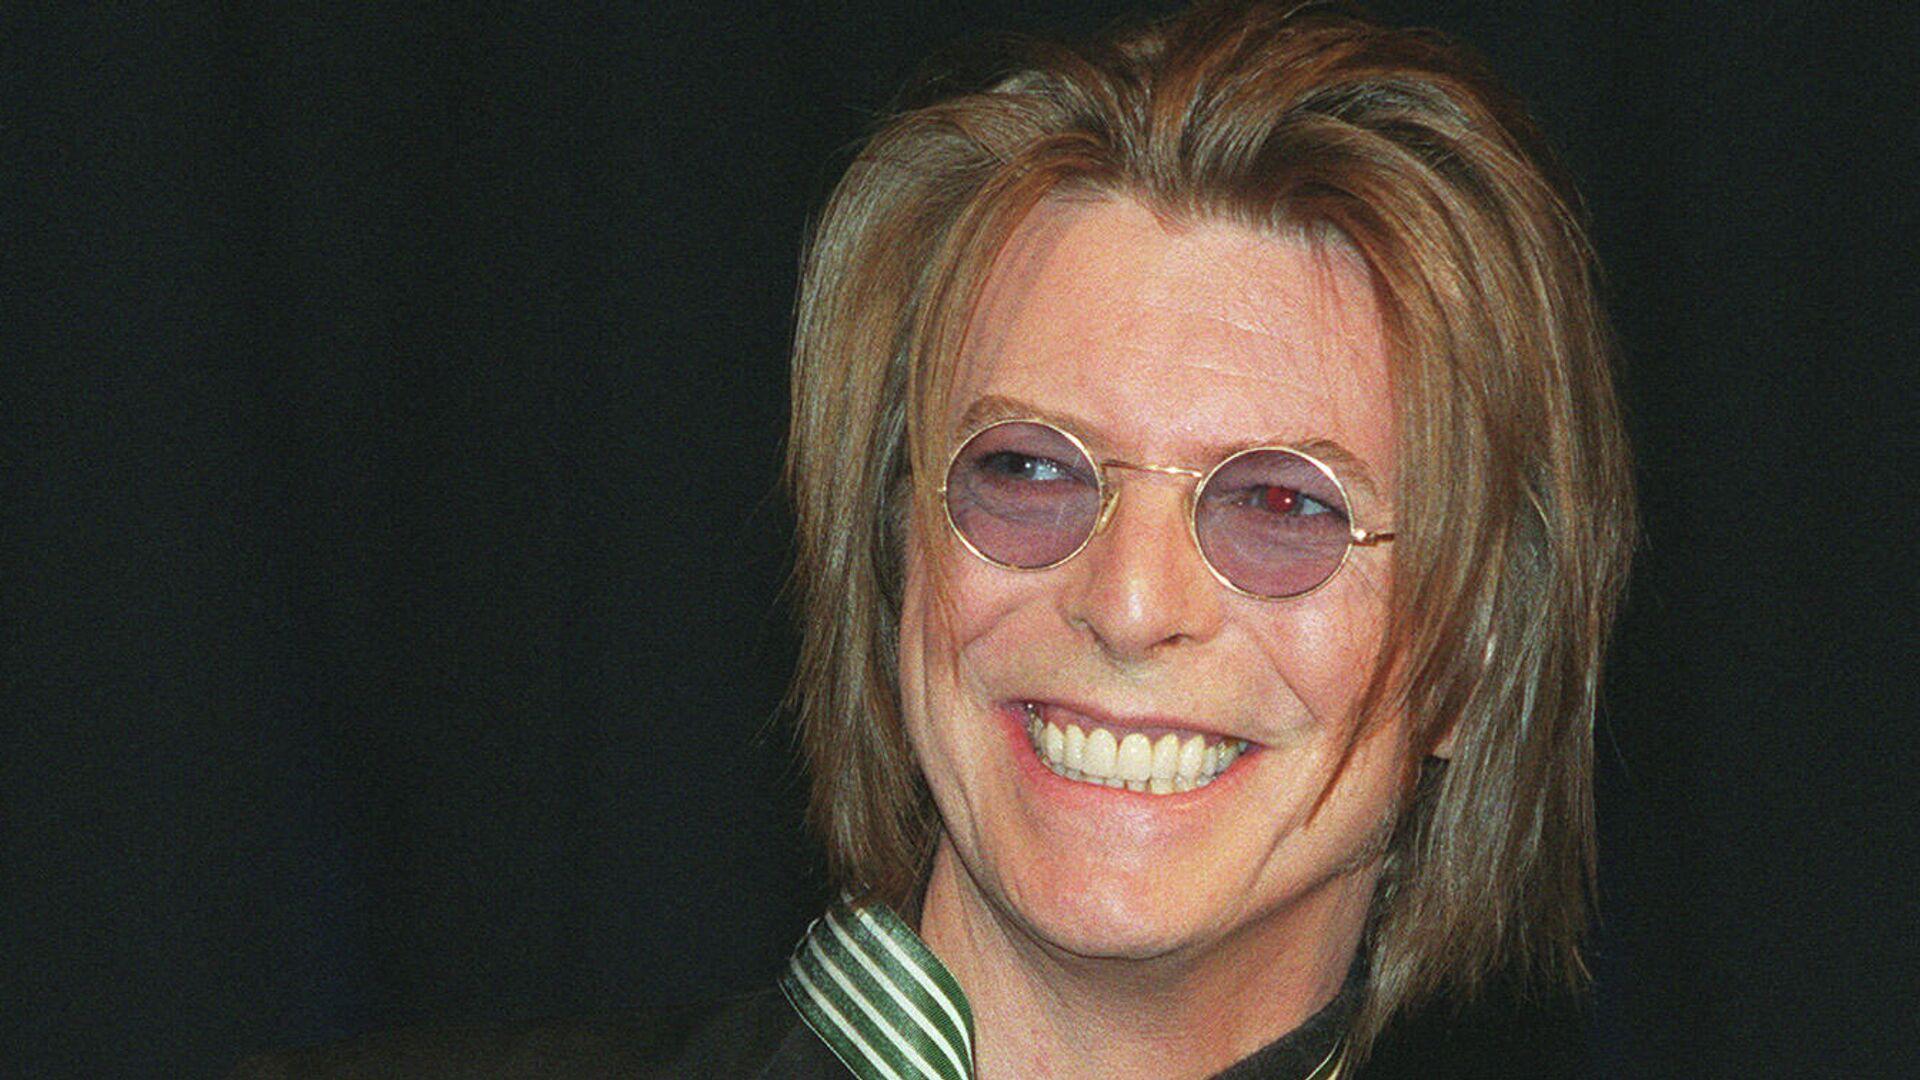 David Bowie en 1999 - Sputnik Mundo, 1920, 17.06.2021